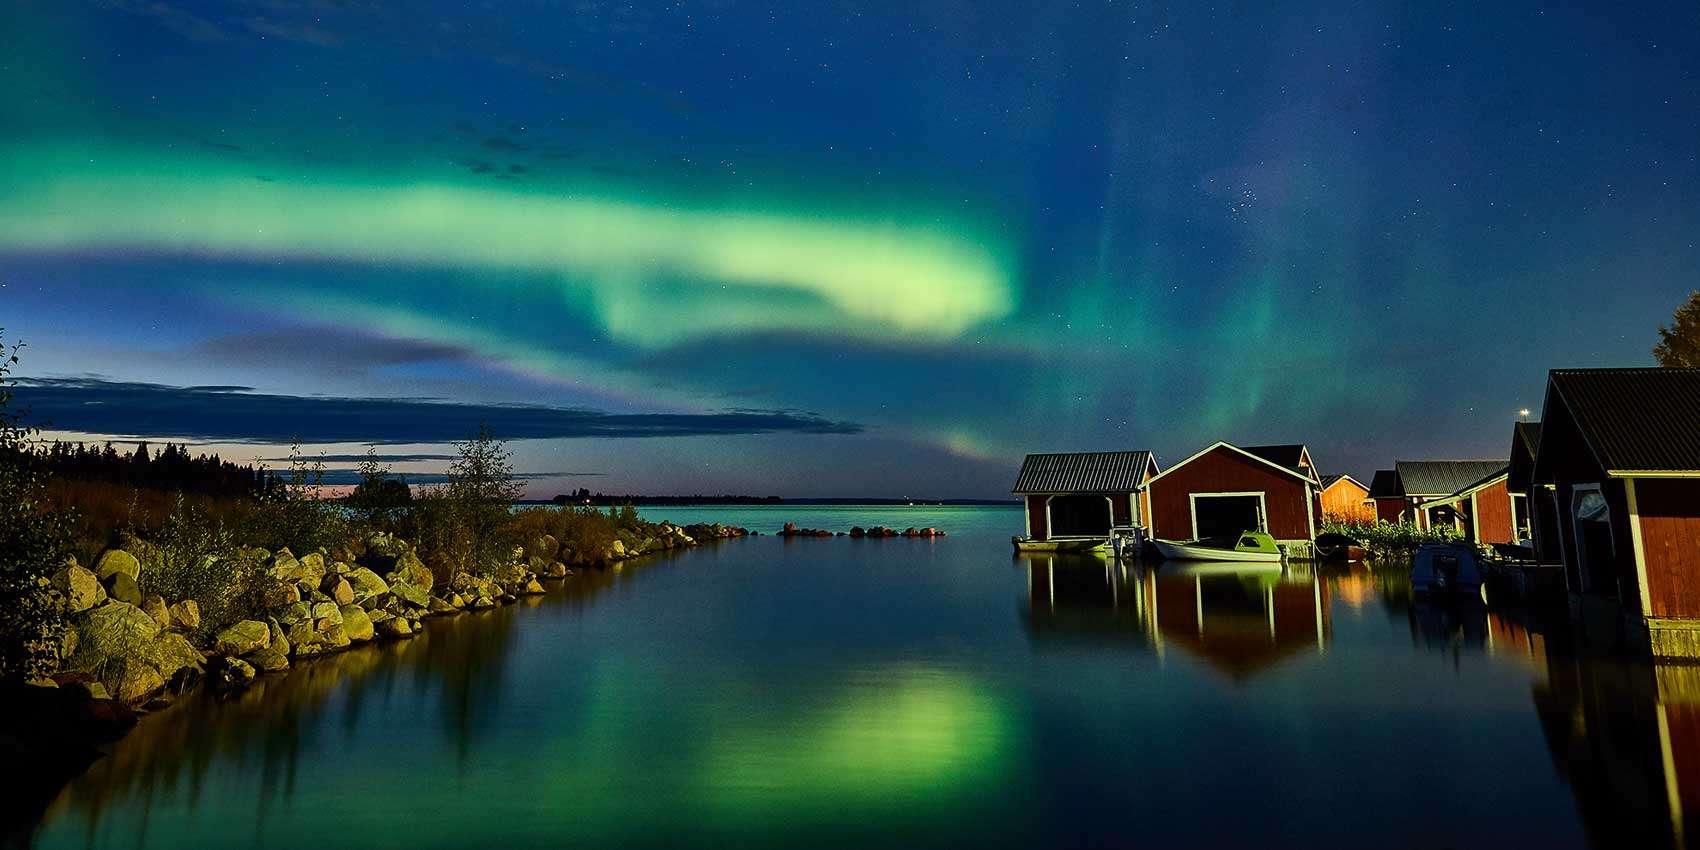 Finland December Northern Lights